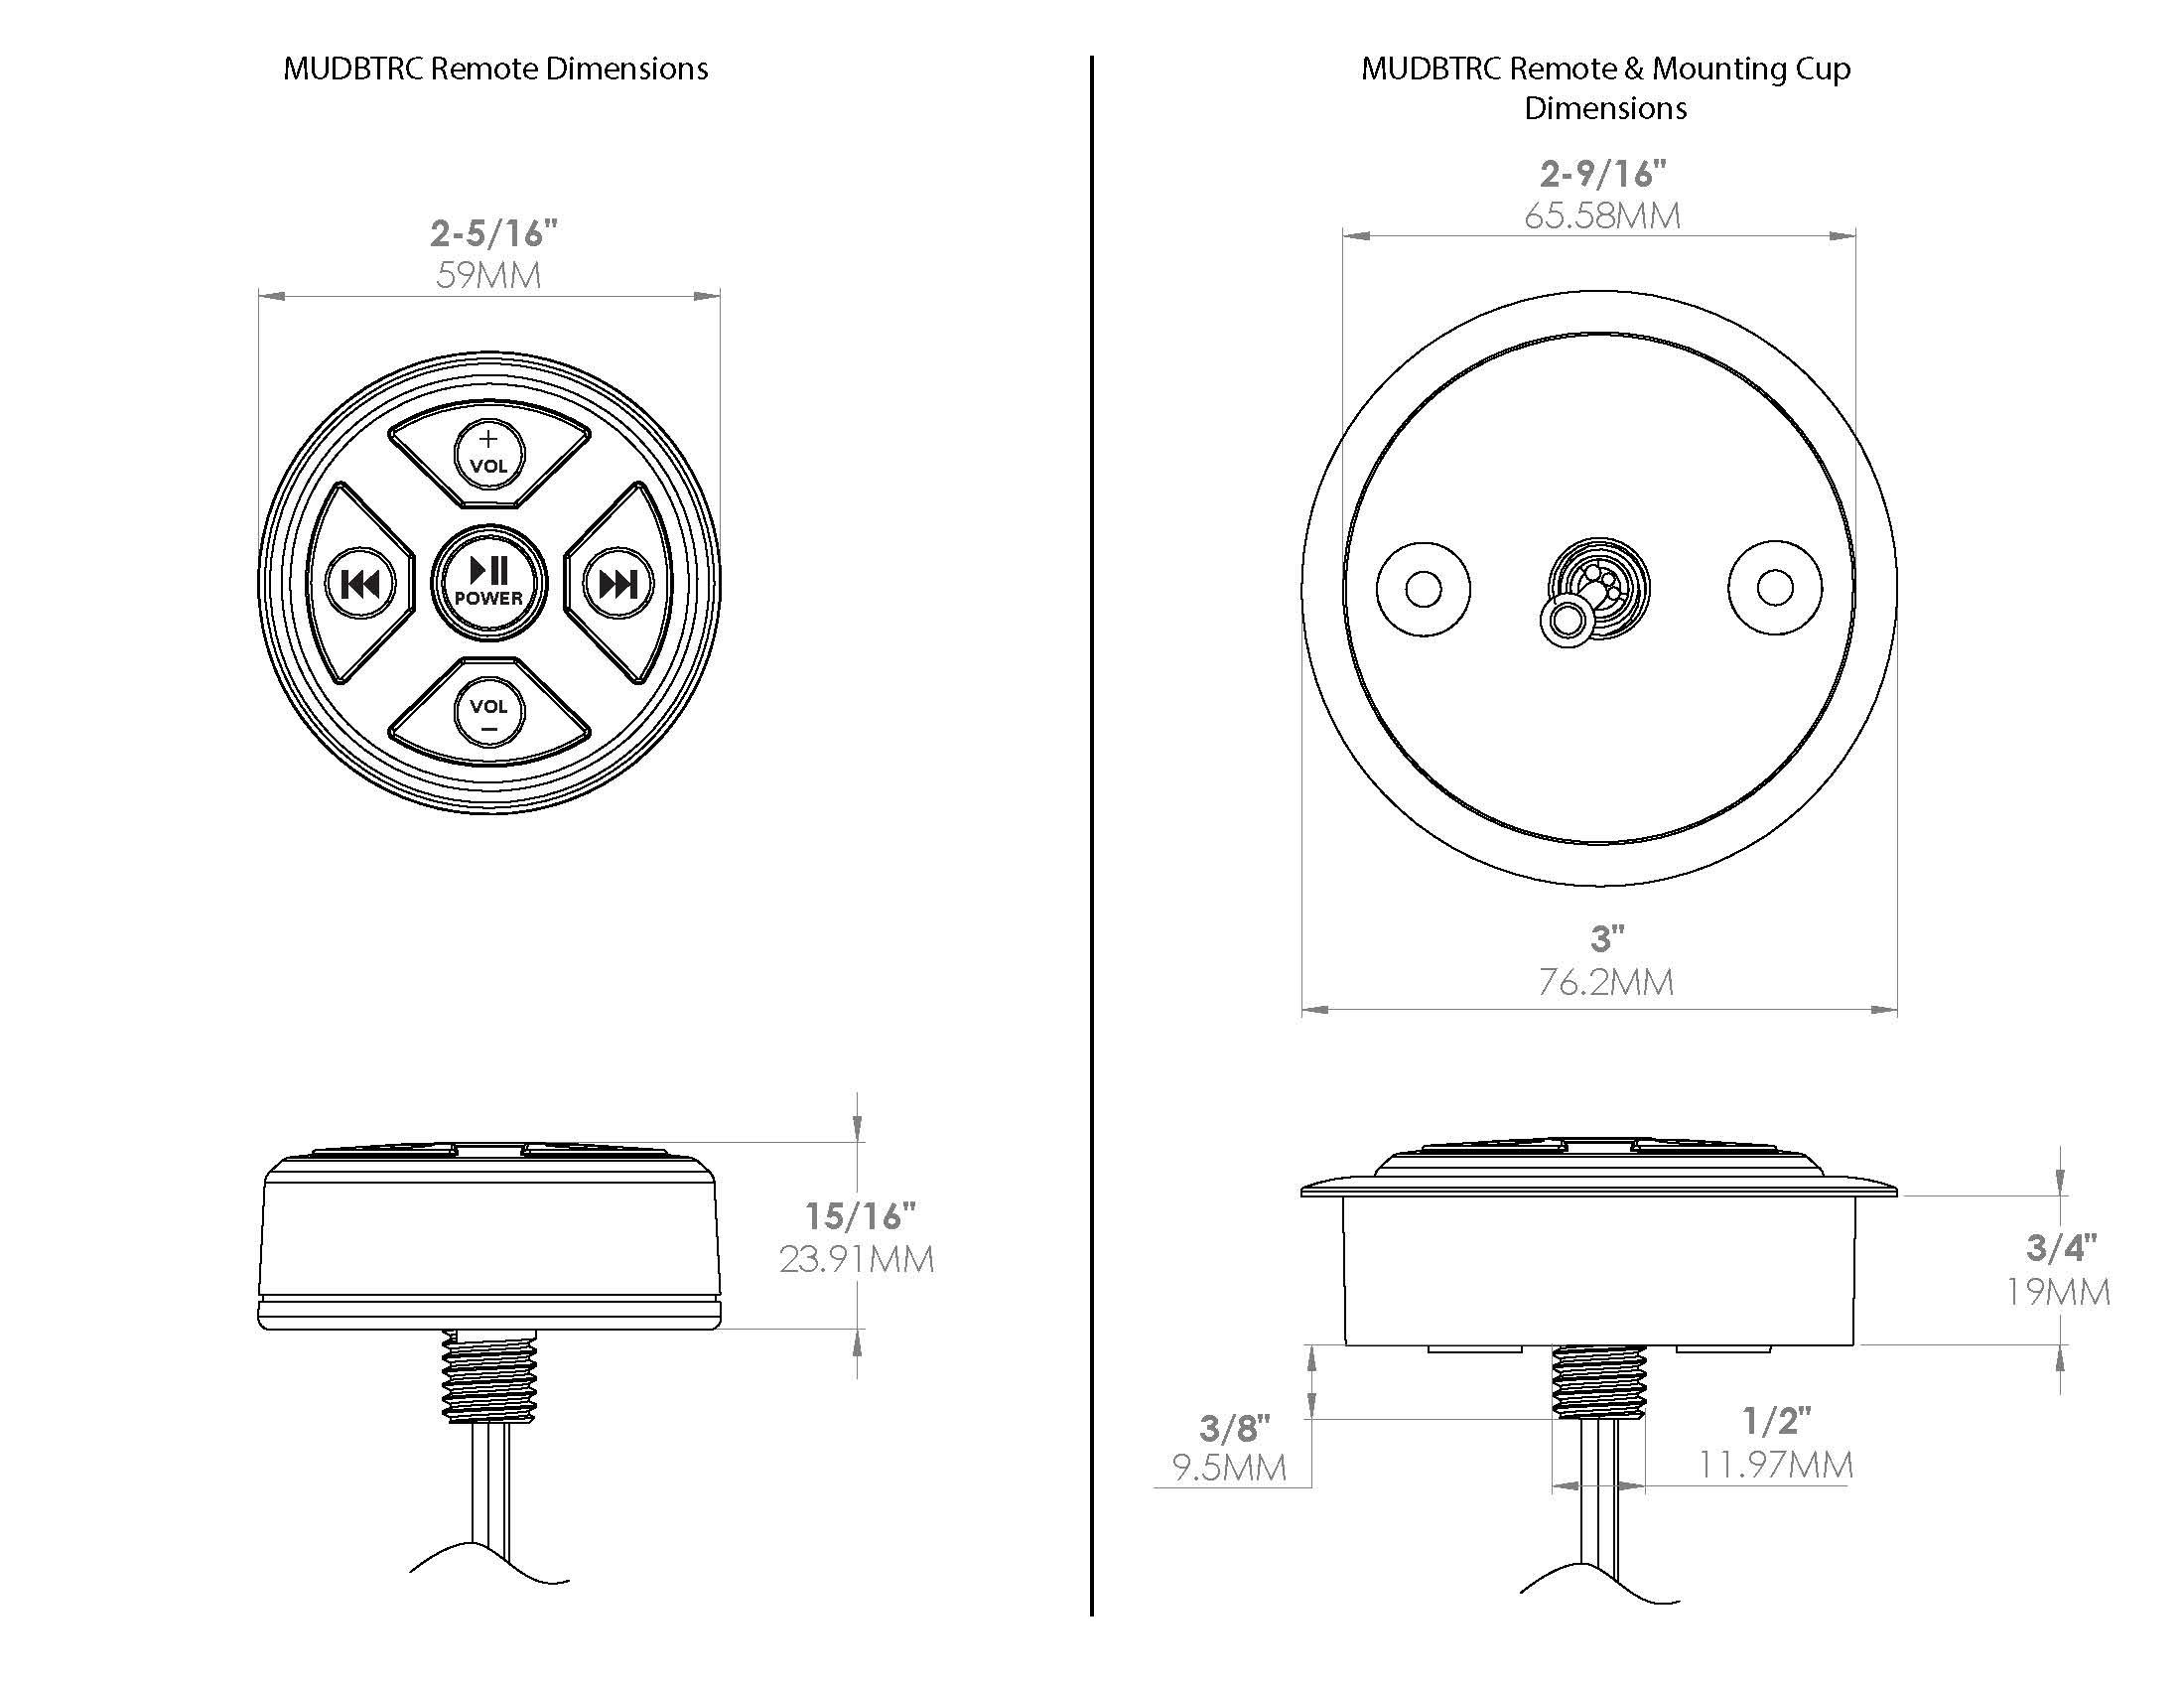 MUDBTRC Universal Bluetooth Receiver and Remote Control